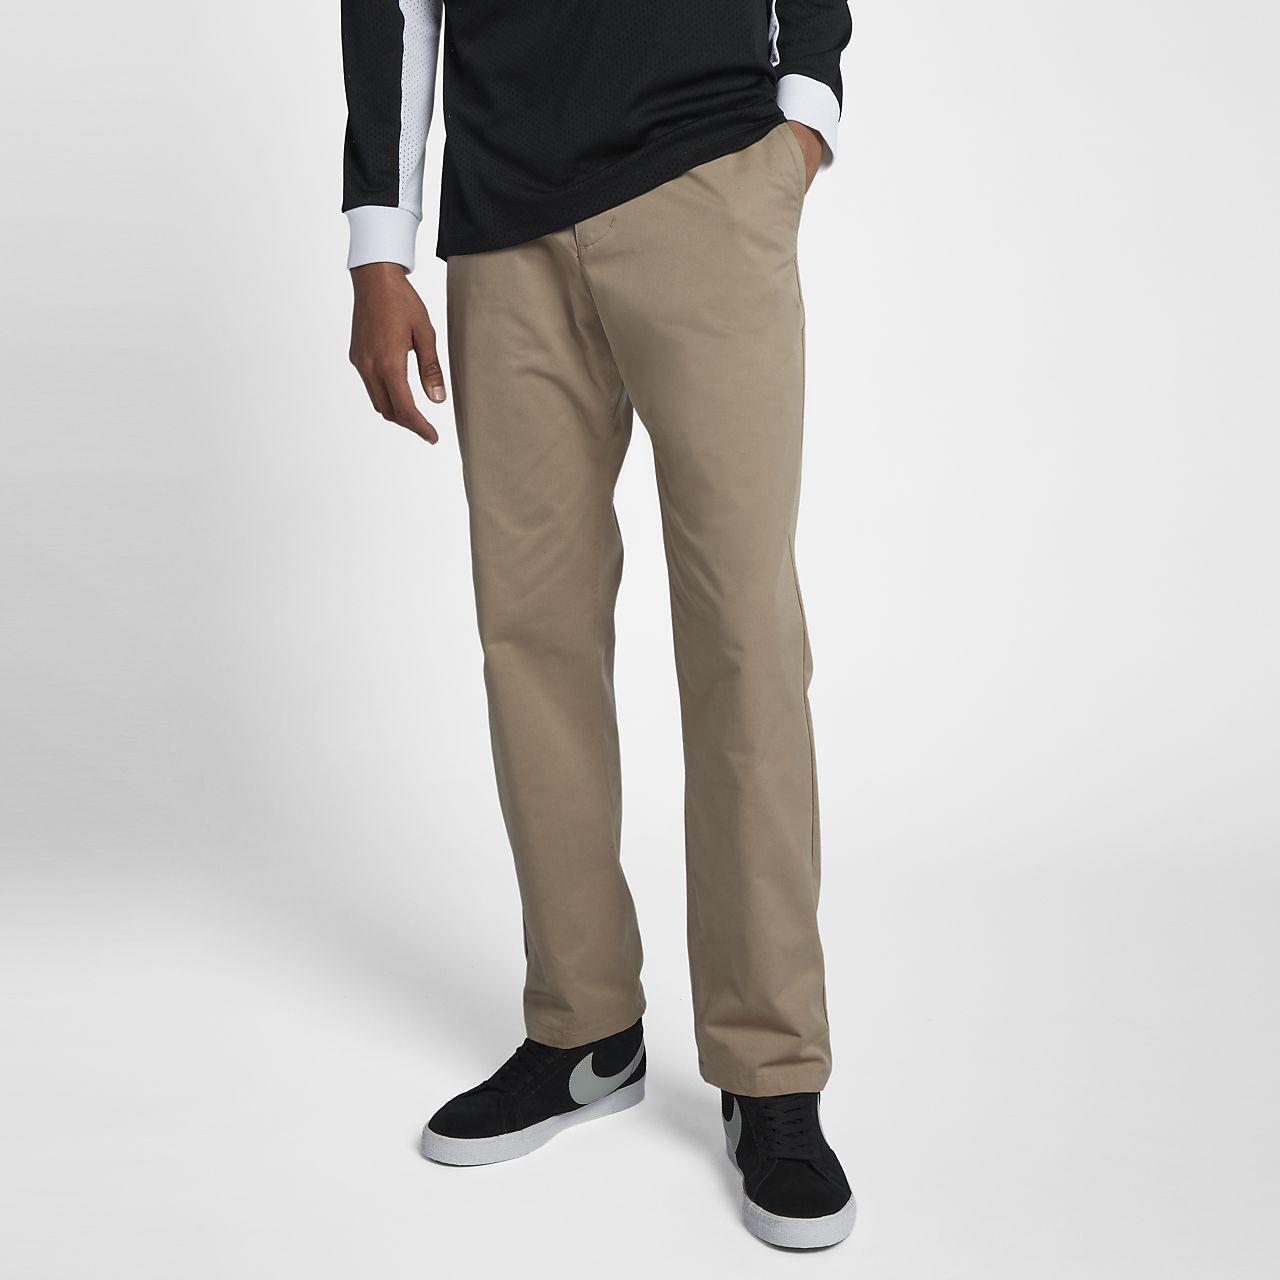 Standard Pantalon Sb Pour Homme Dri Coupe Fit Ca Nike Ftm 55qvgPrx